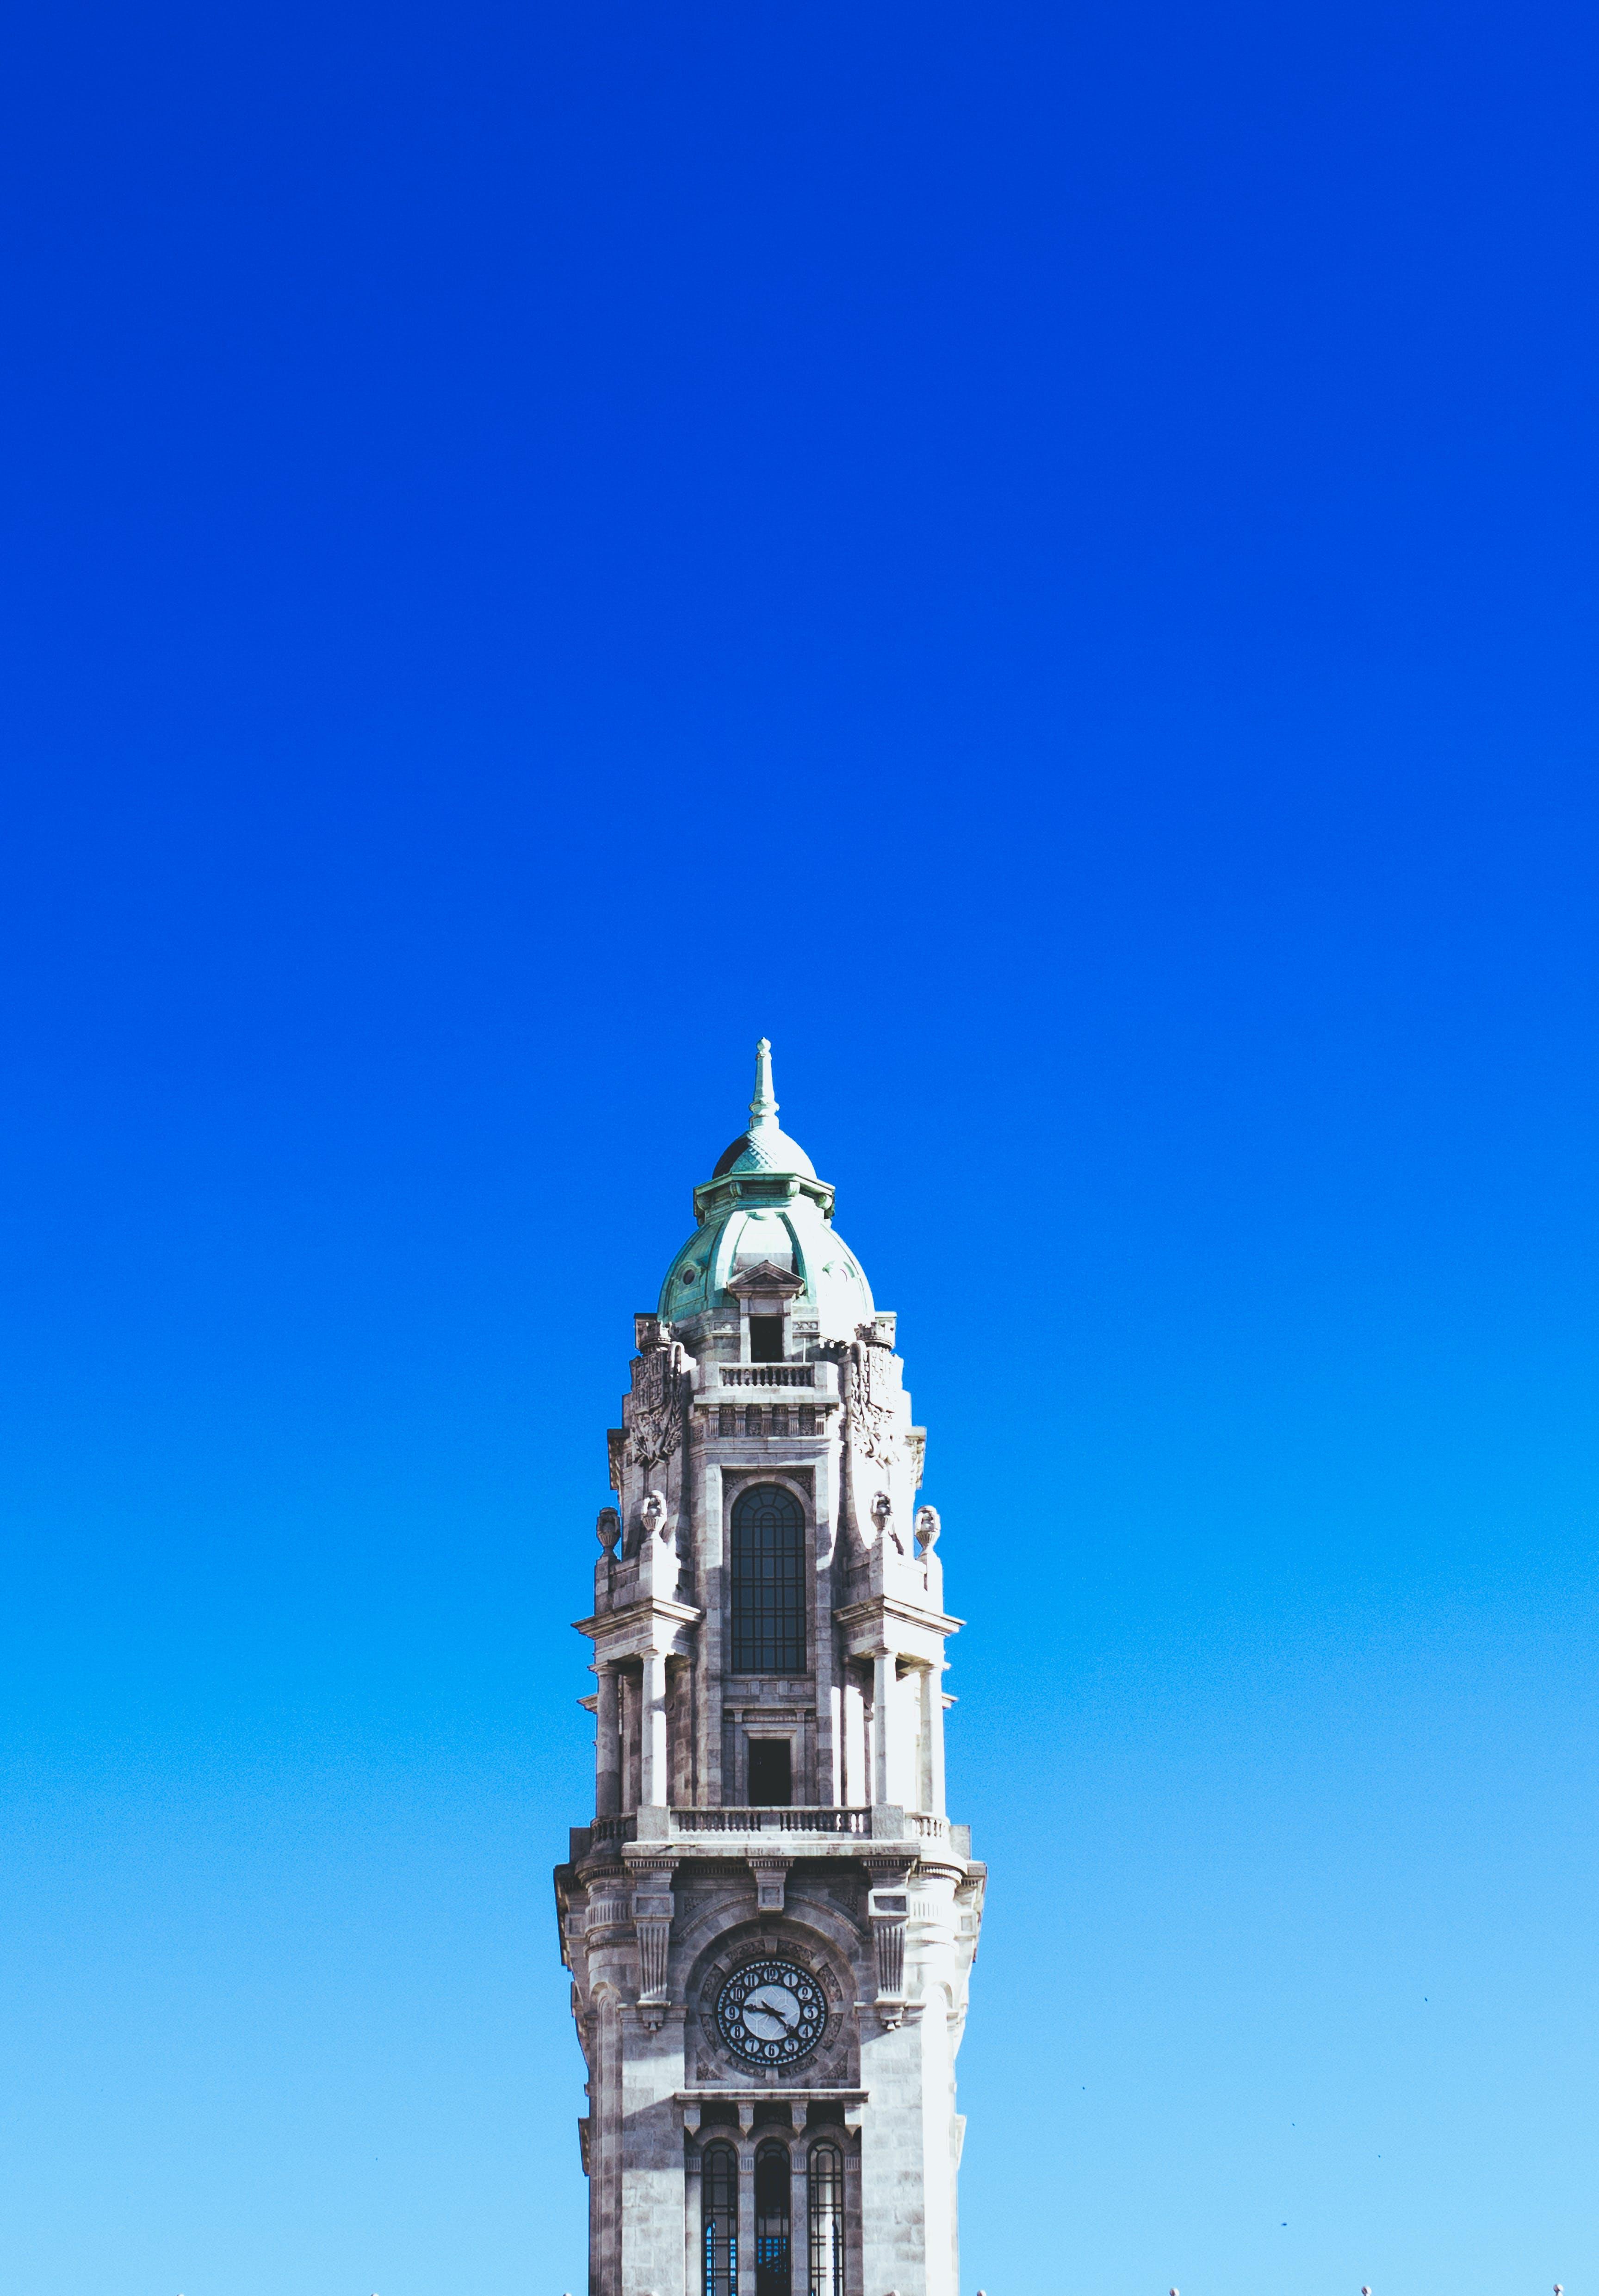 Gray Concrete Clock Tower Under Blue Sky